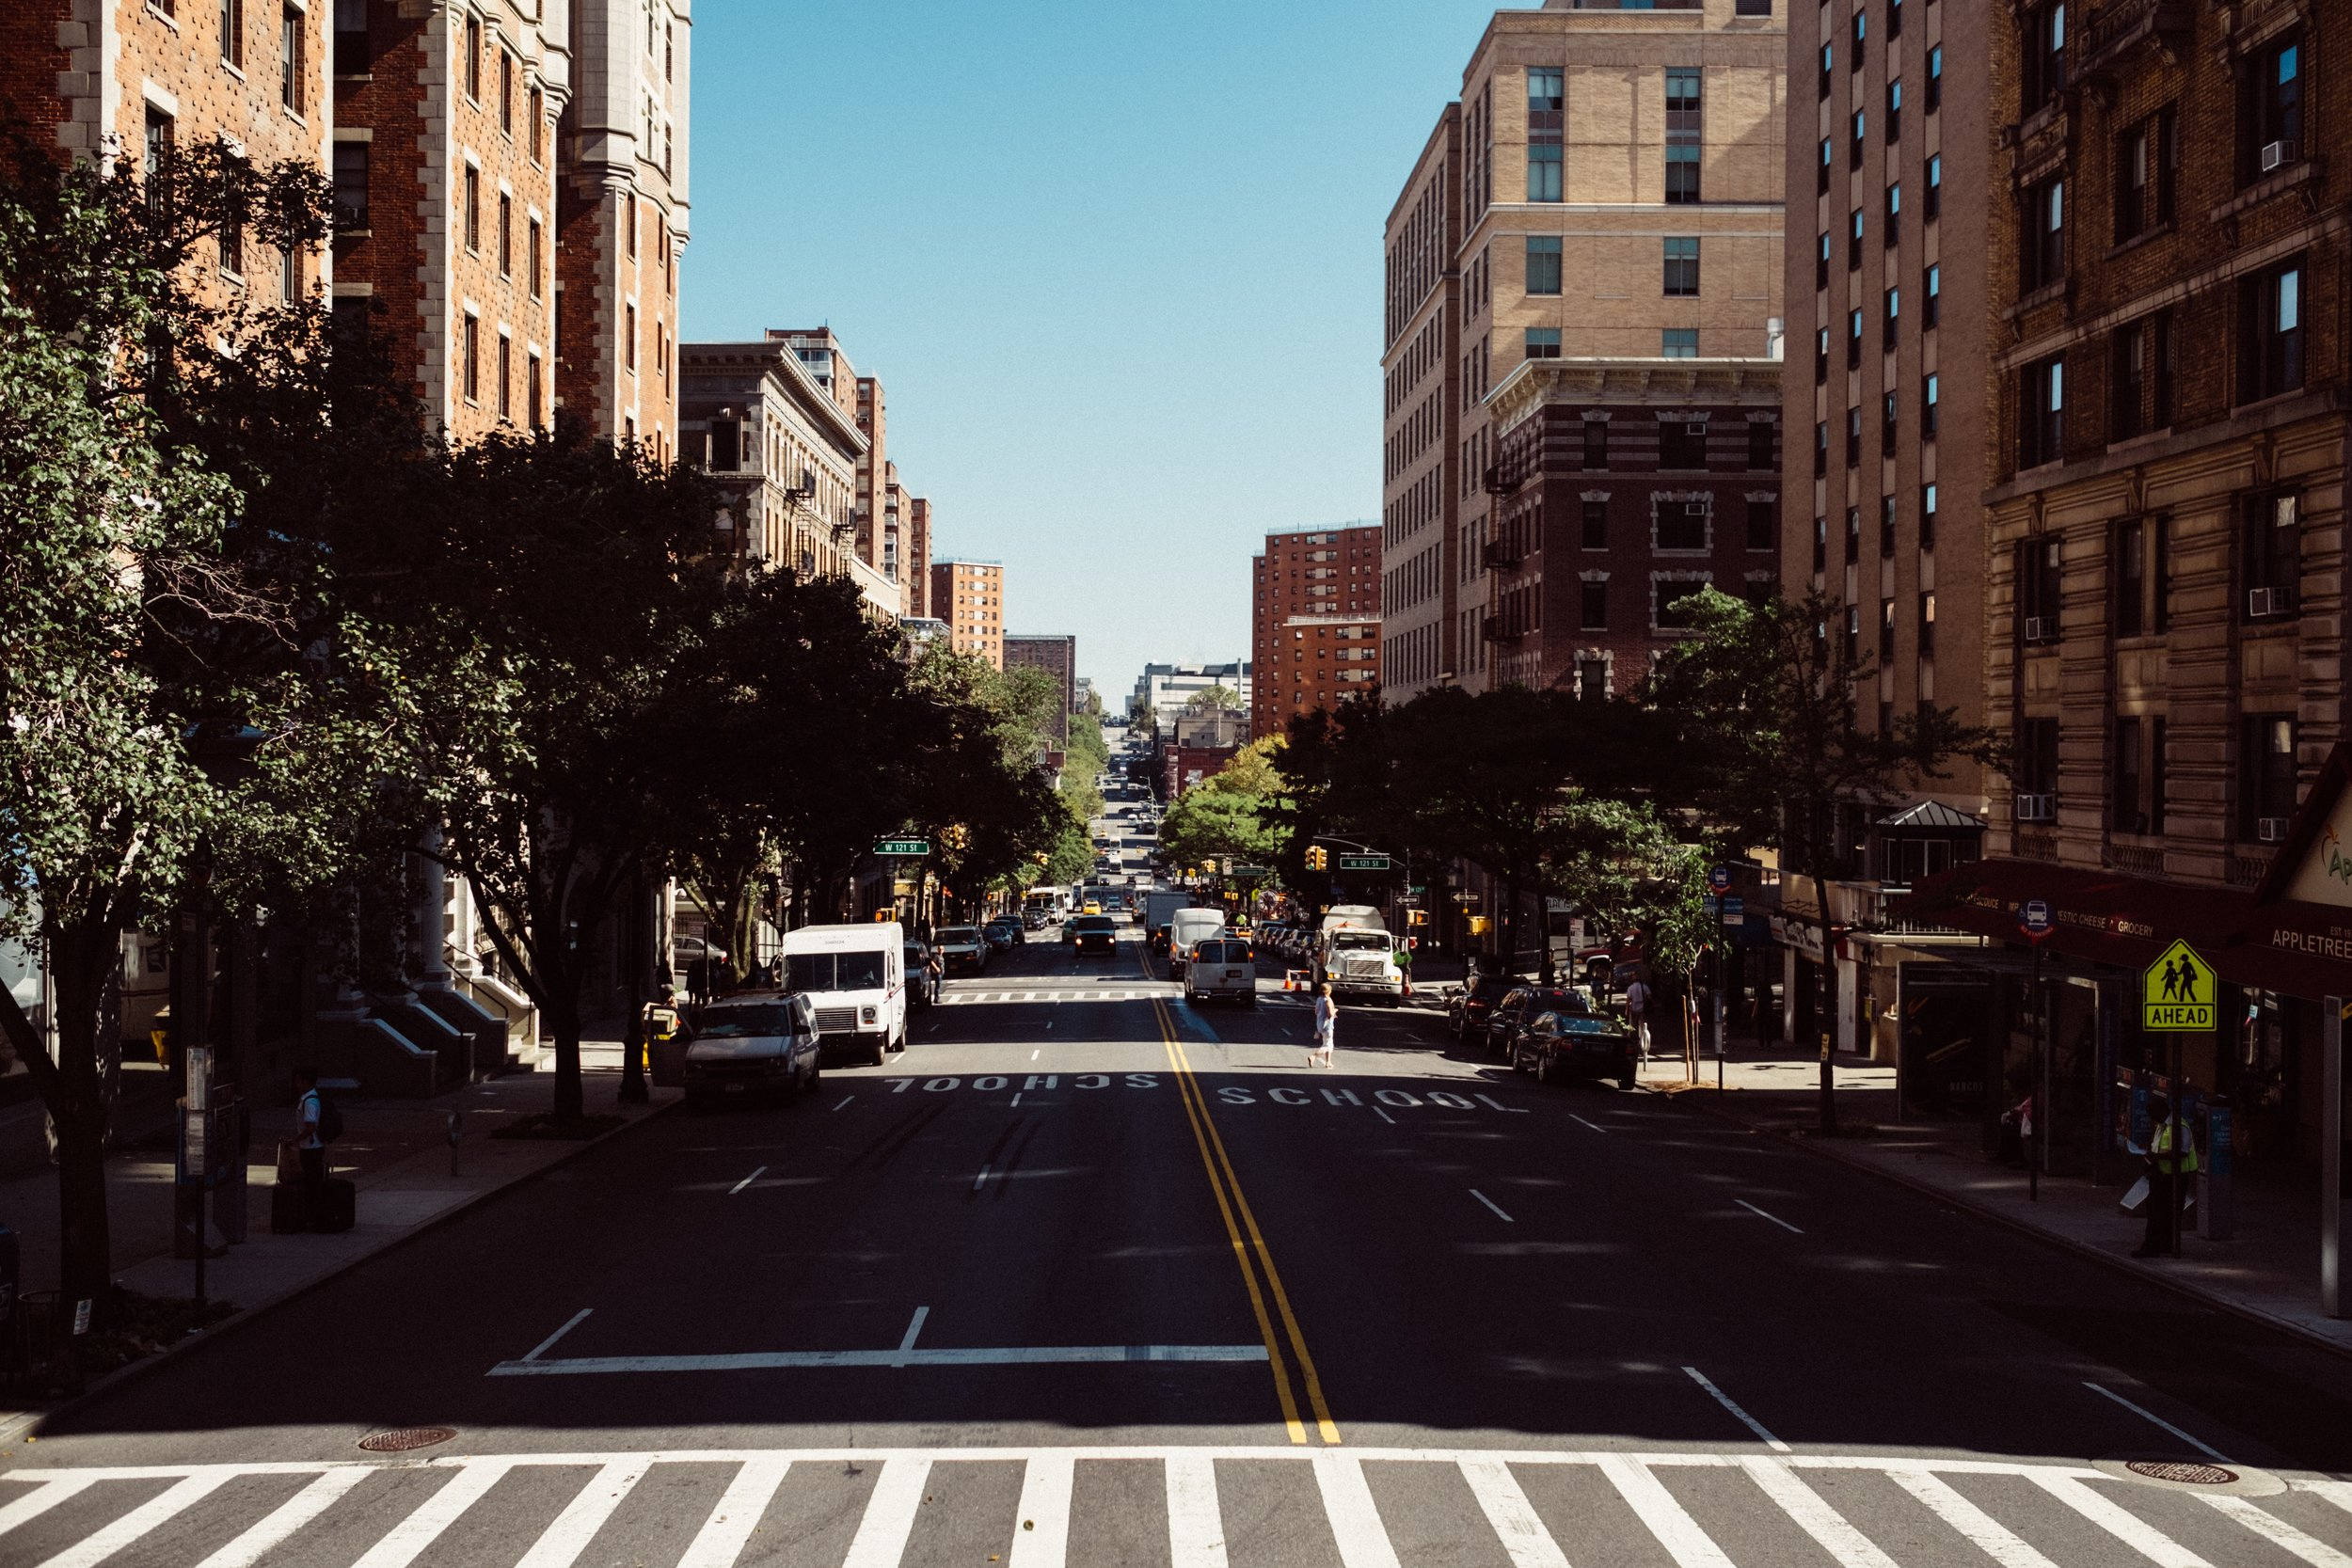 2019.9.1devivre_concierge)services_services_new_york_city_NYC_Concierge.jpg